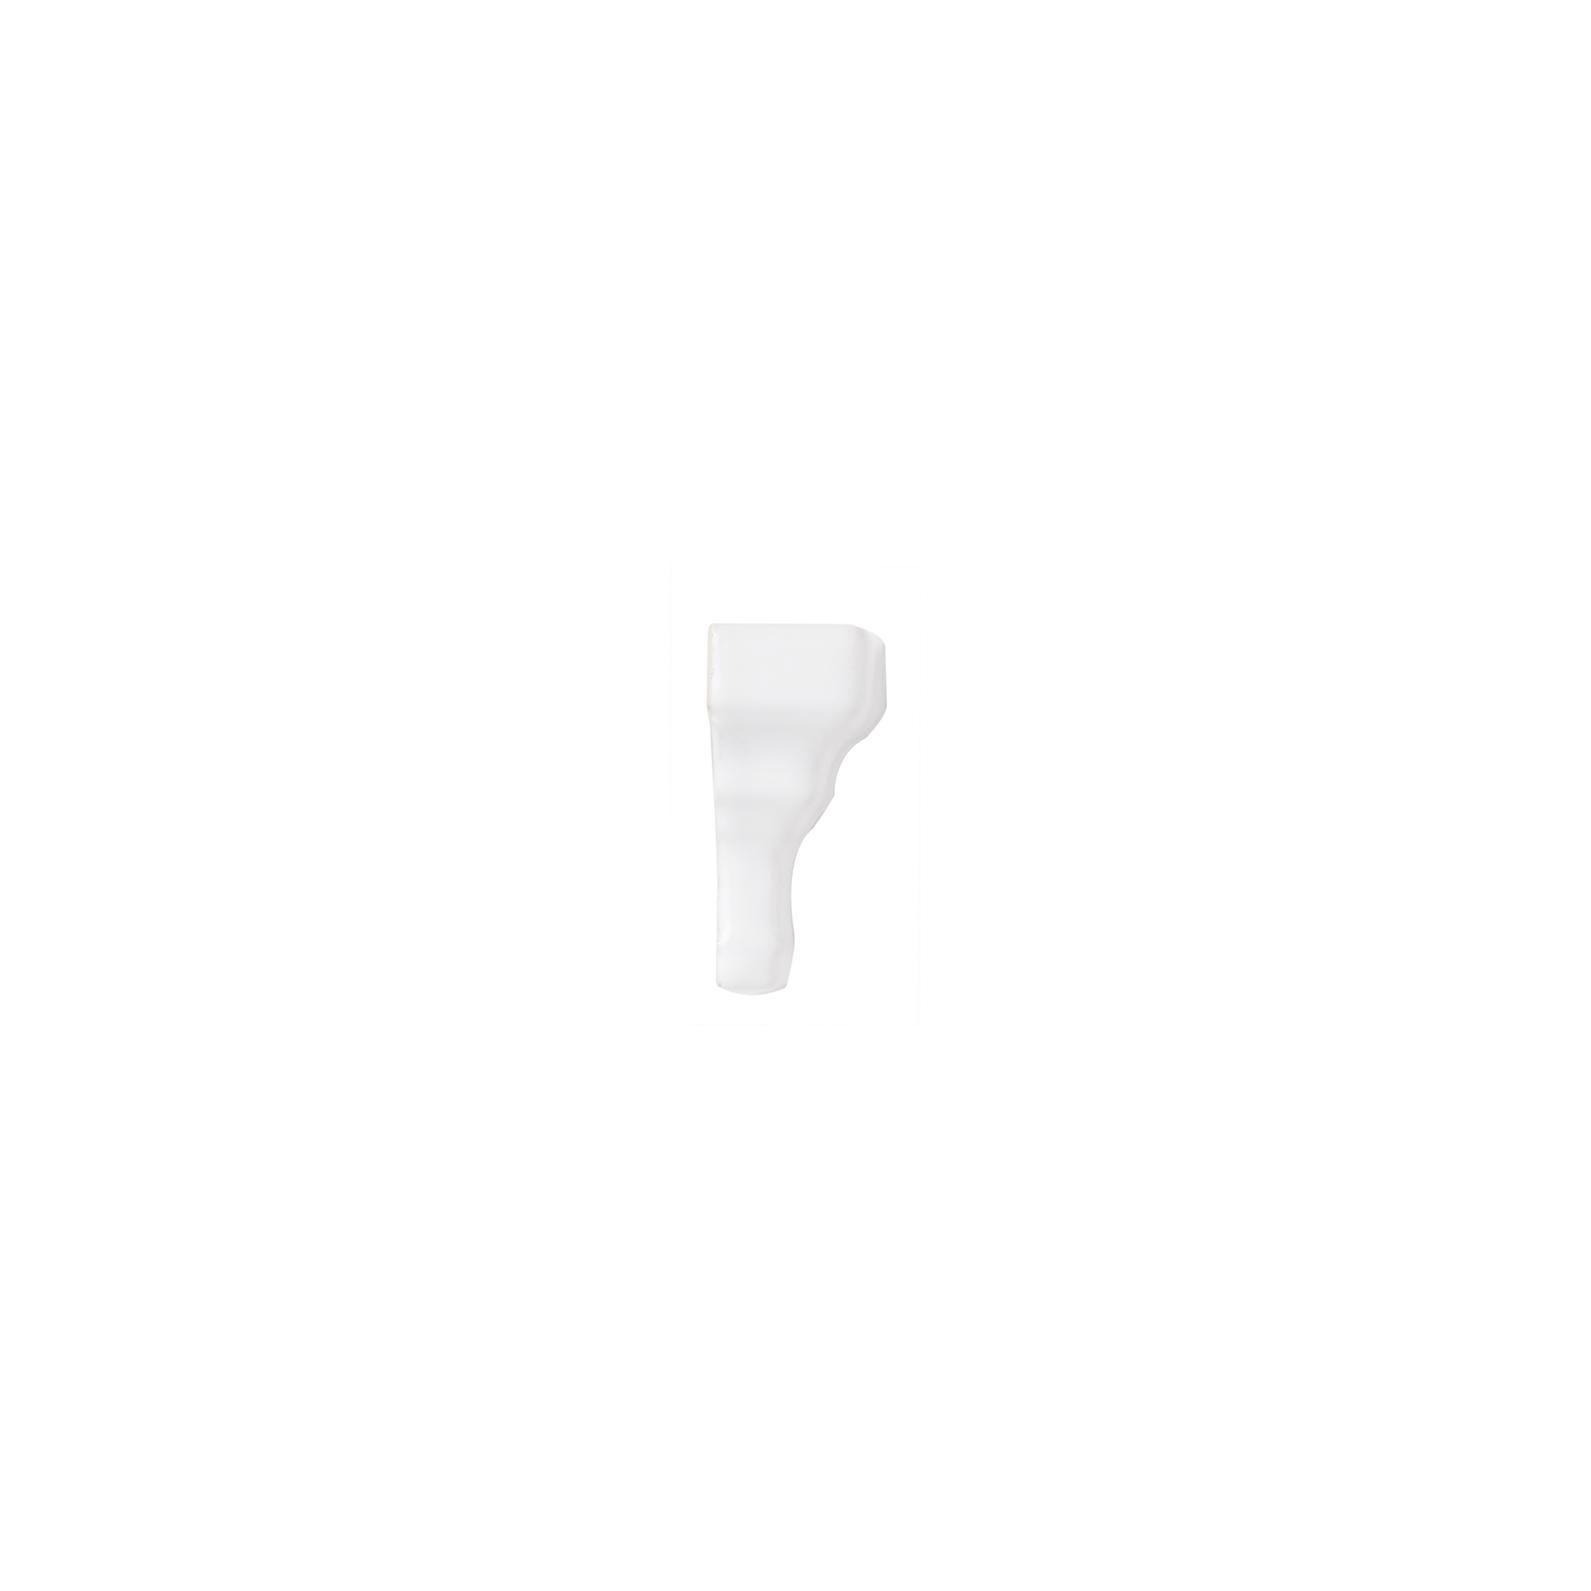 ADST5282 - ANGULO EXTERIOR CORNISA - 5 cm X 19.8 cm